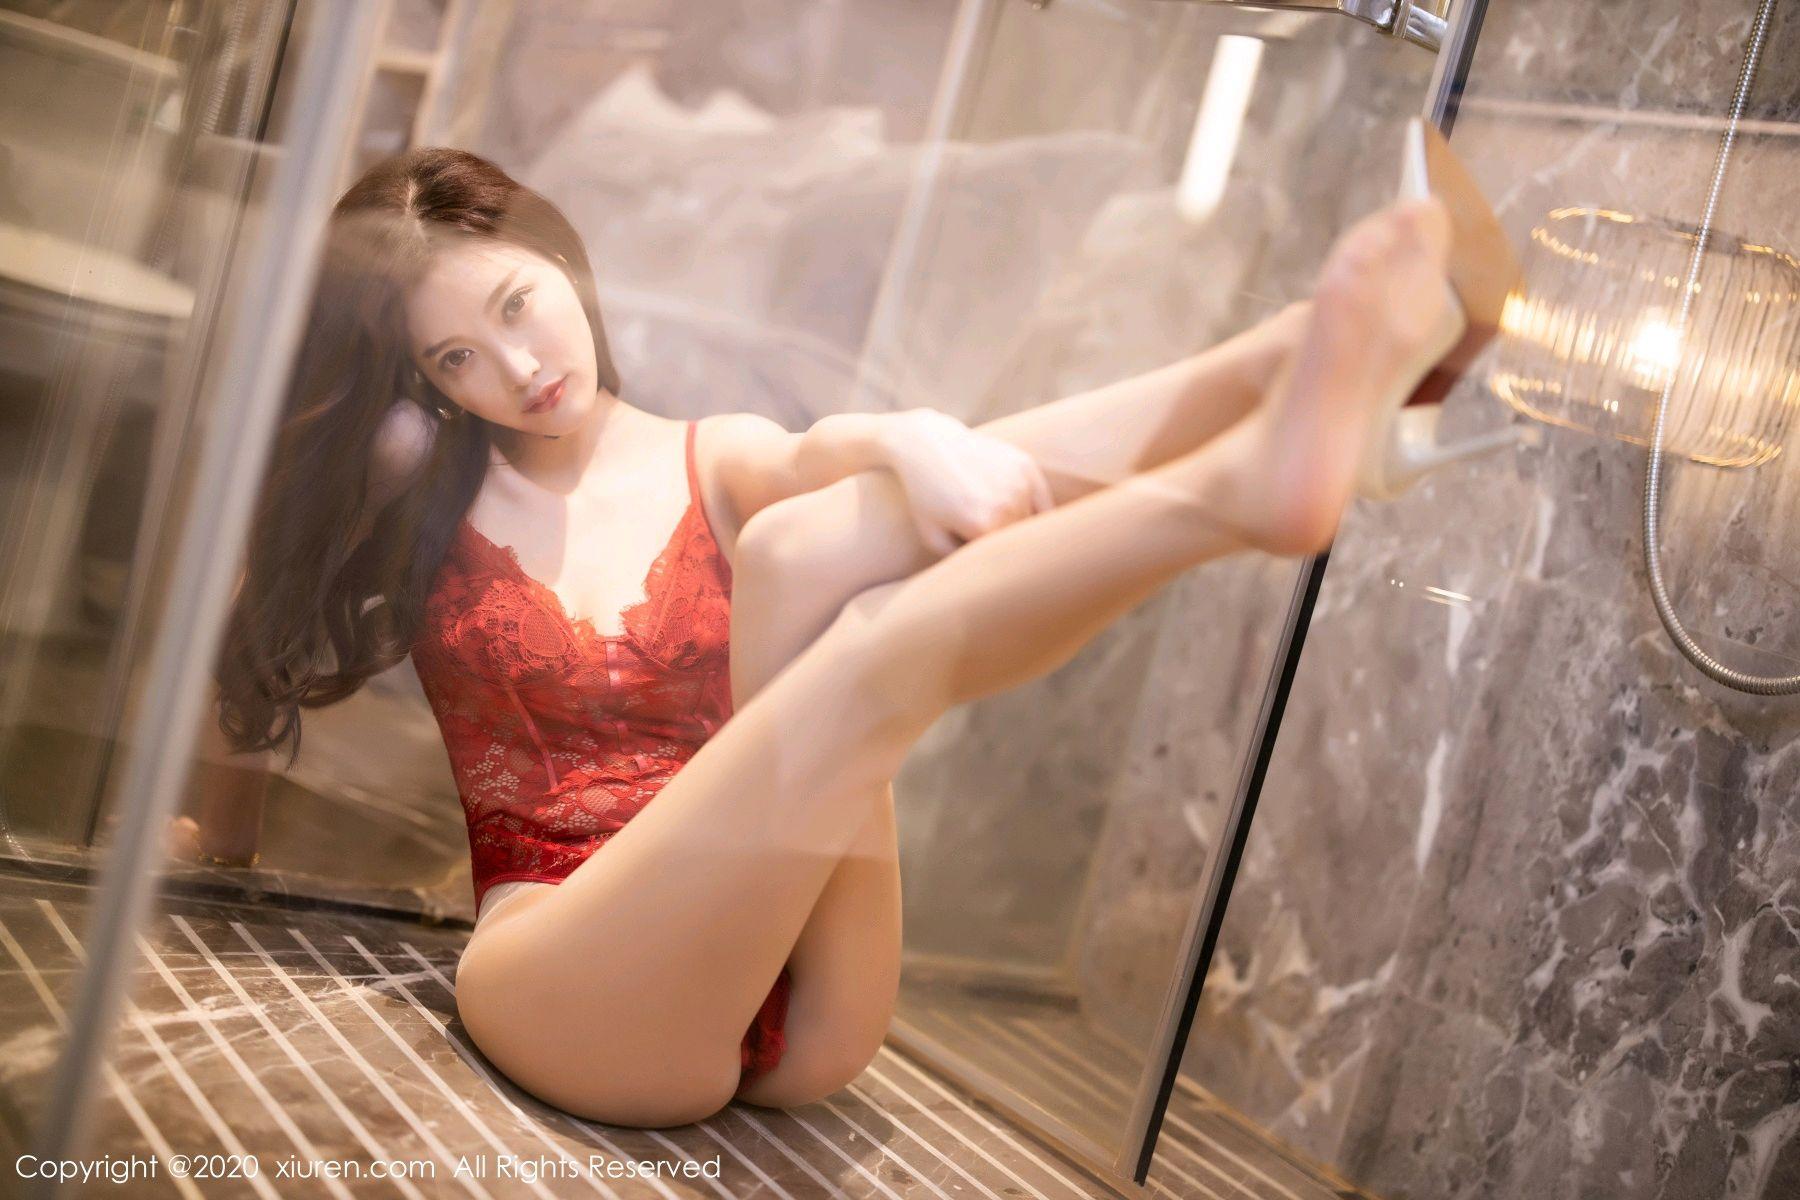 [XiuRen] Vol.2671 Yang Chen Chen 60P, Underwear, Xiuren, Yang Chen Chen